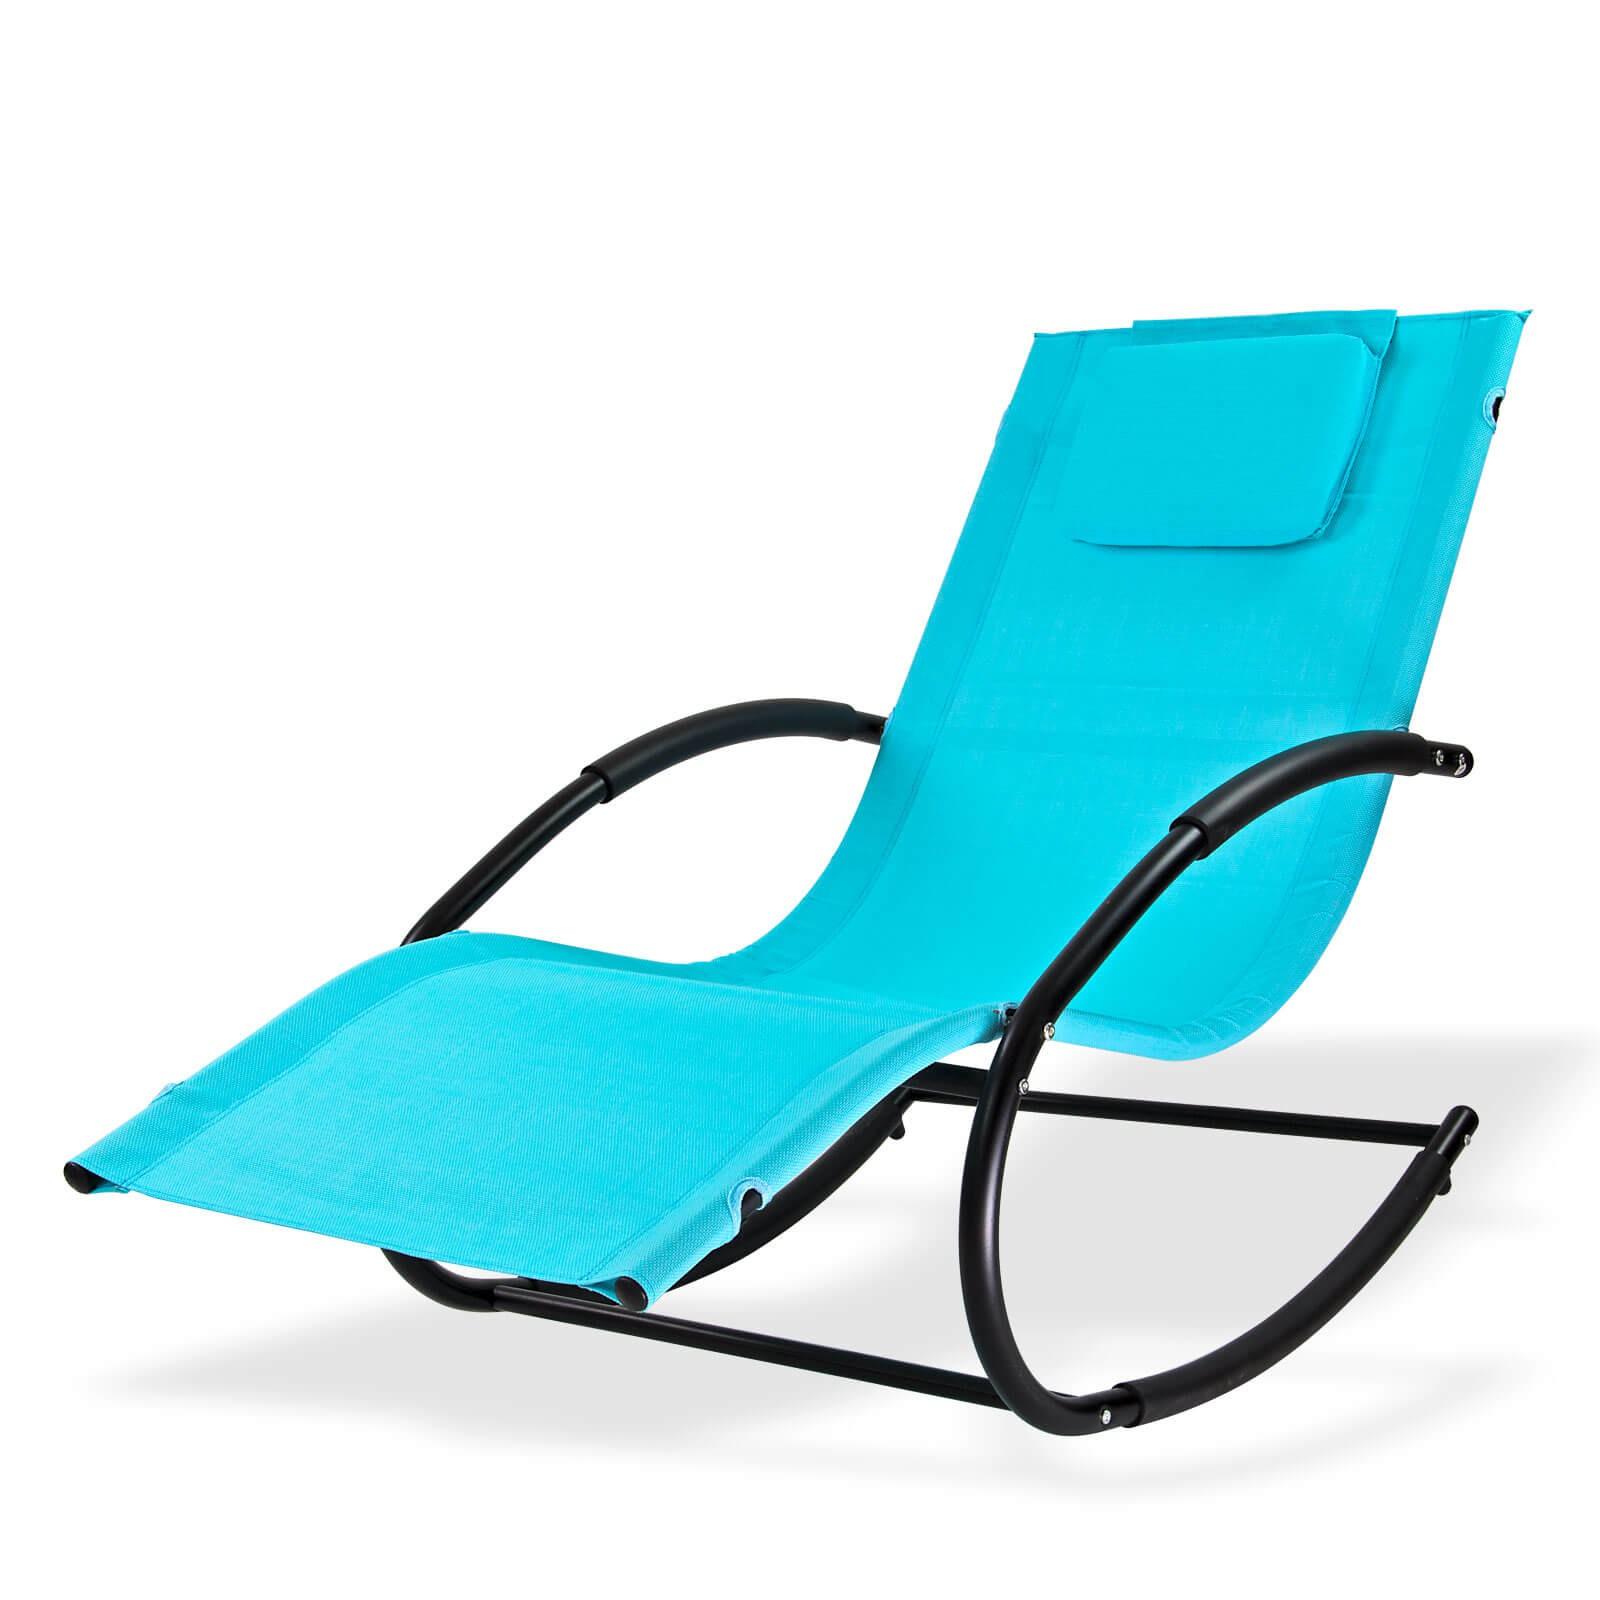 Dema Sonnenliege / Relaxliege Swing - Farbe nach Wahl var-Relaxliege-Swing